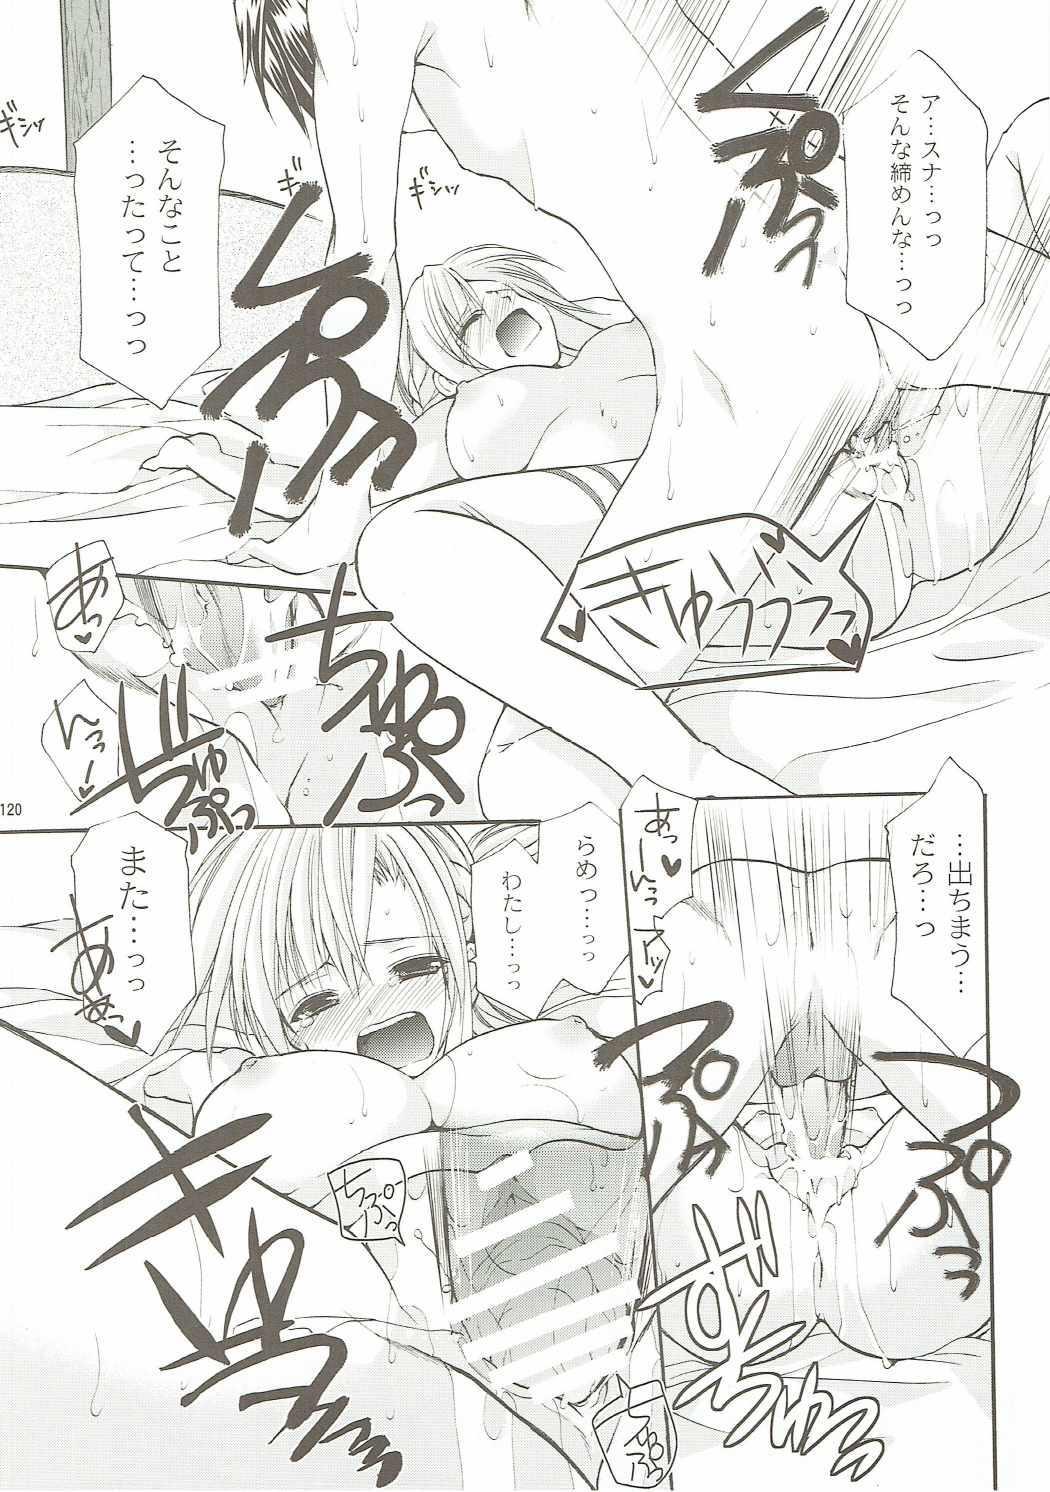 ANIME COLLECTION Imomuya Honpo - Singleton Anime Soushuuhen 118